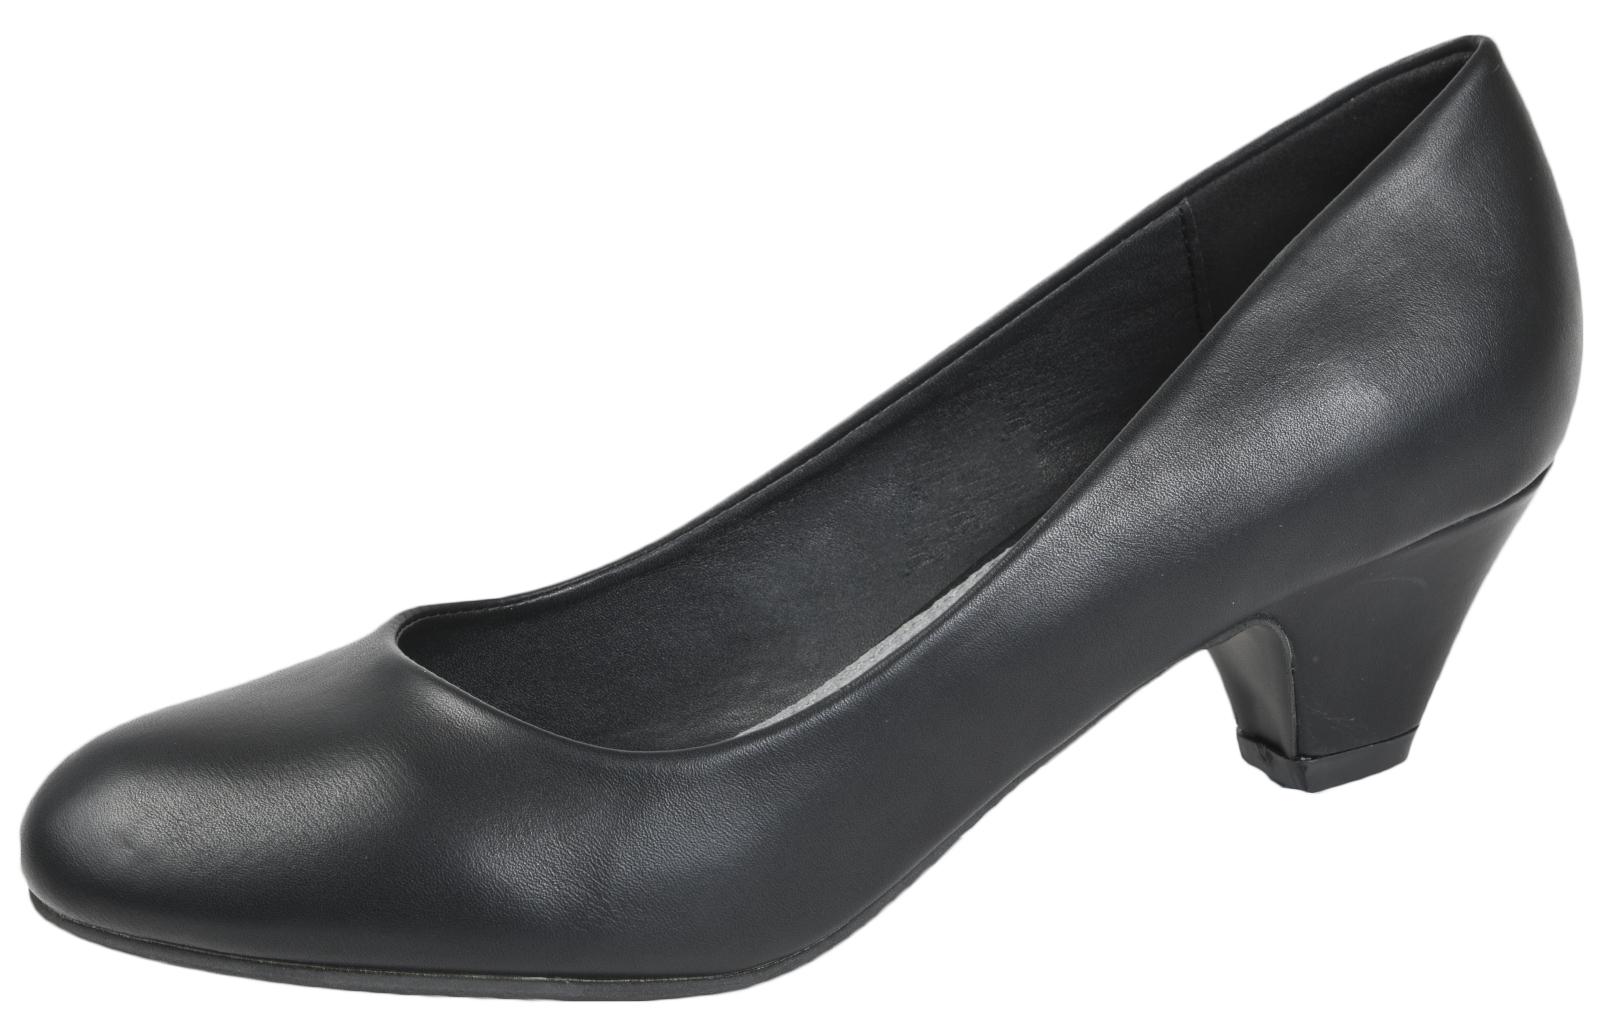 Ladies-Leather-Lined-Low-Block-Heels-Comfort-Work-Office-Court-Shoes-Ladies-Size miniatuur 19